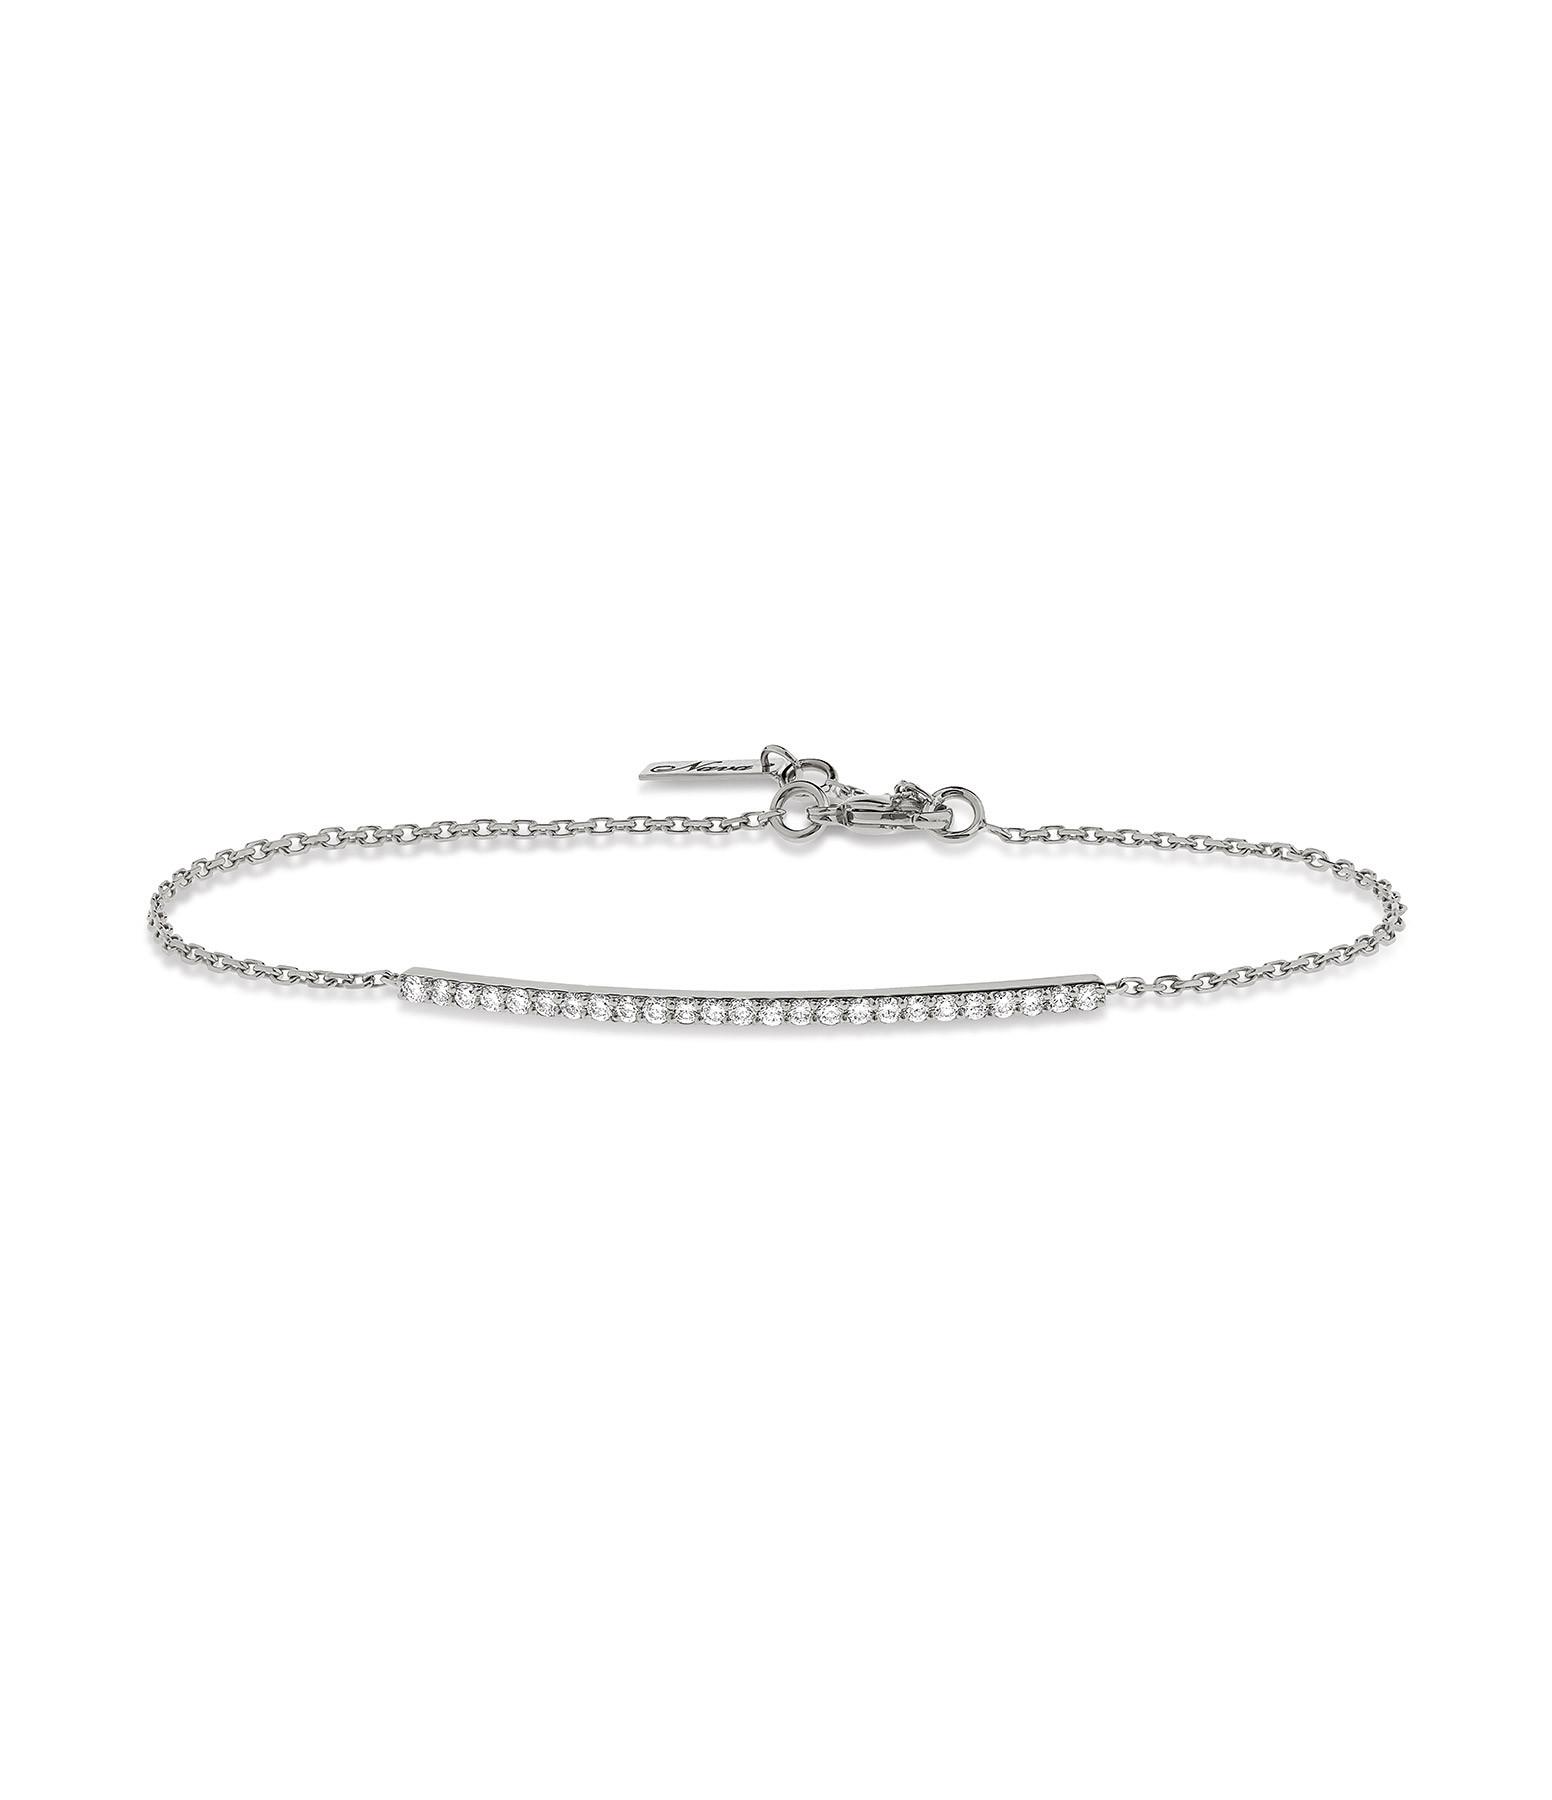 NAVA JOAILLERIE - Bracelet Hash Barrette Chaîne Or Blanc